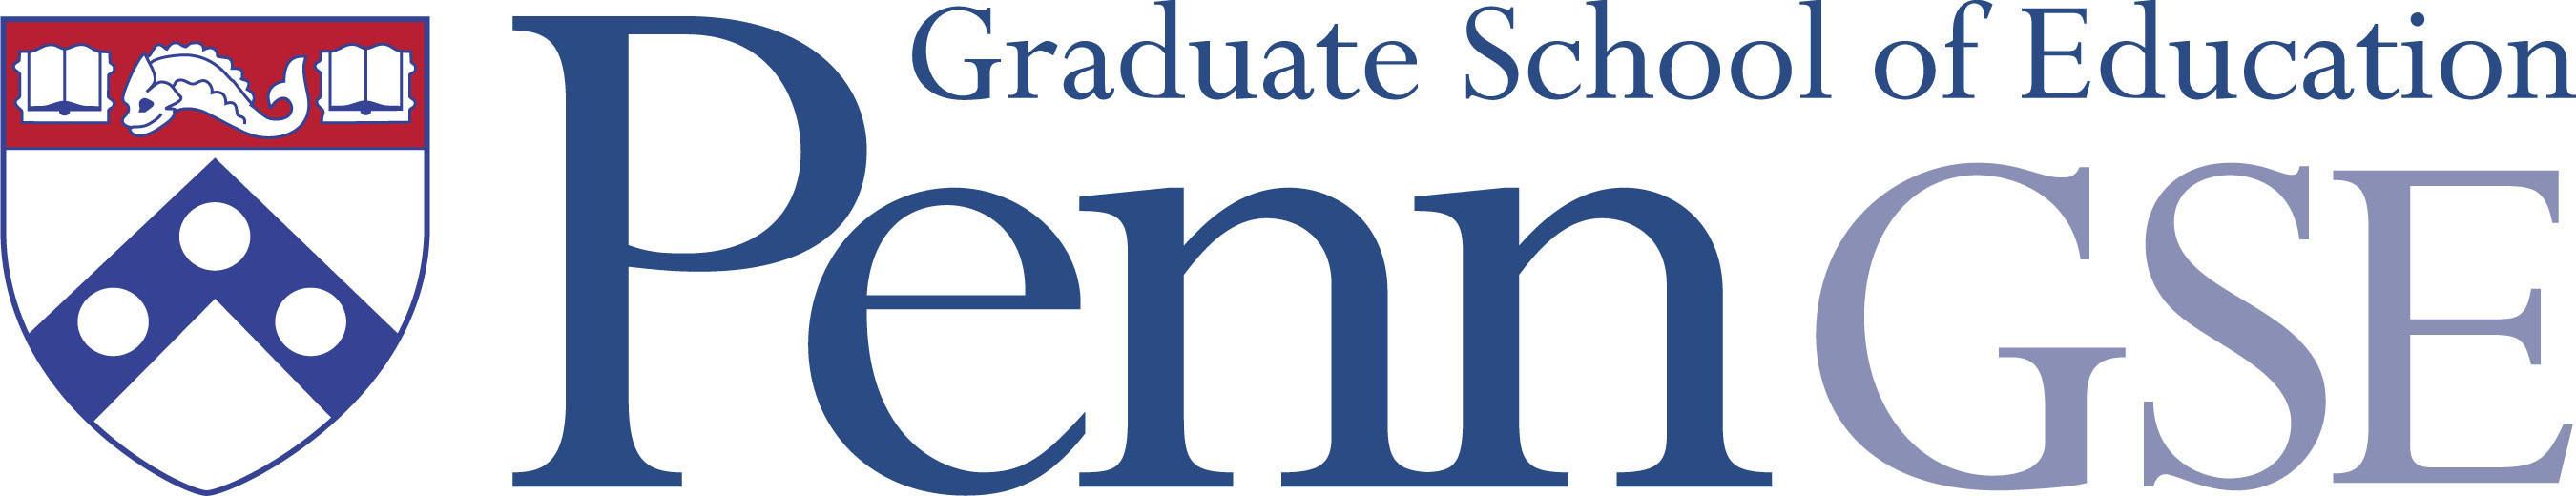 Graduate School of Education (GSE) at the University of Pennsylvania